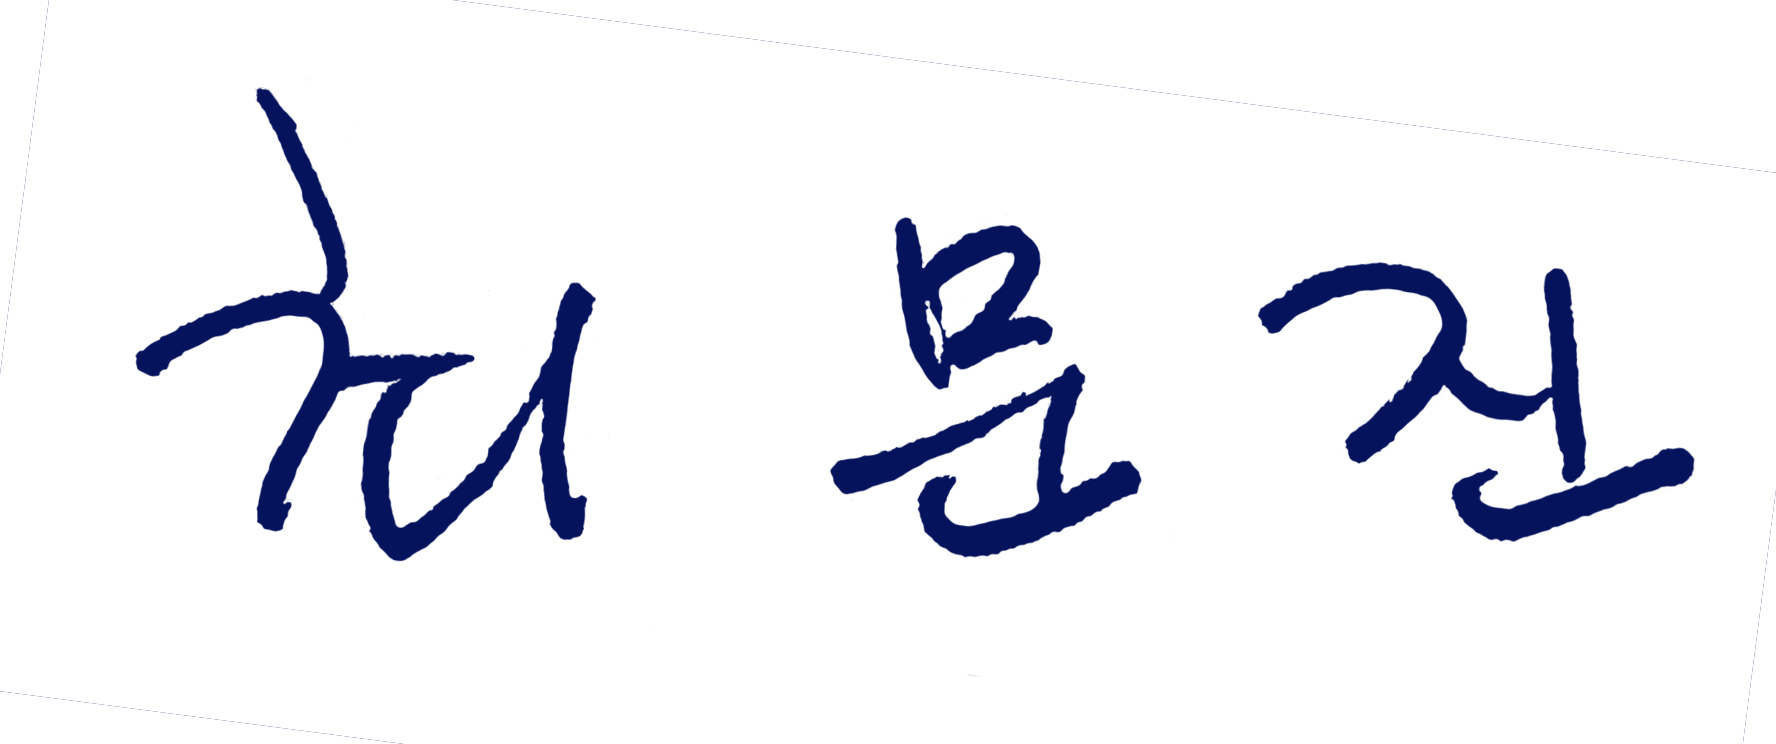 mjc서명1.png